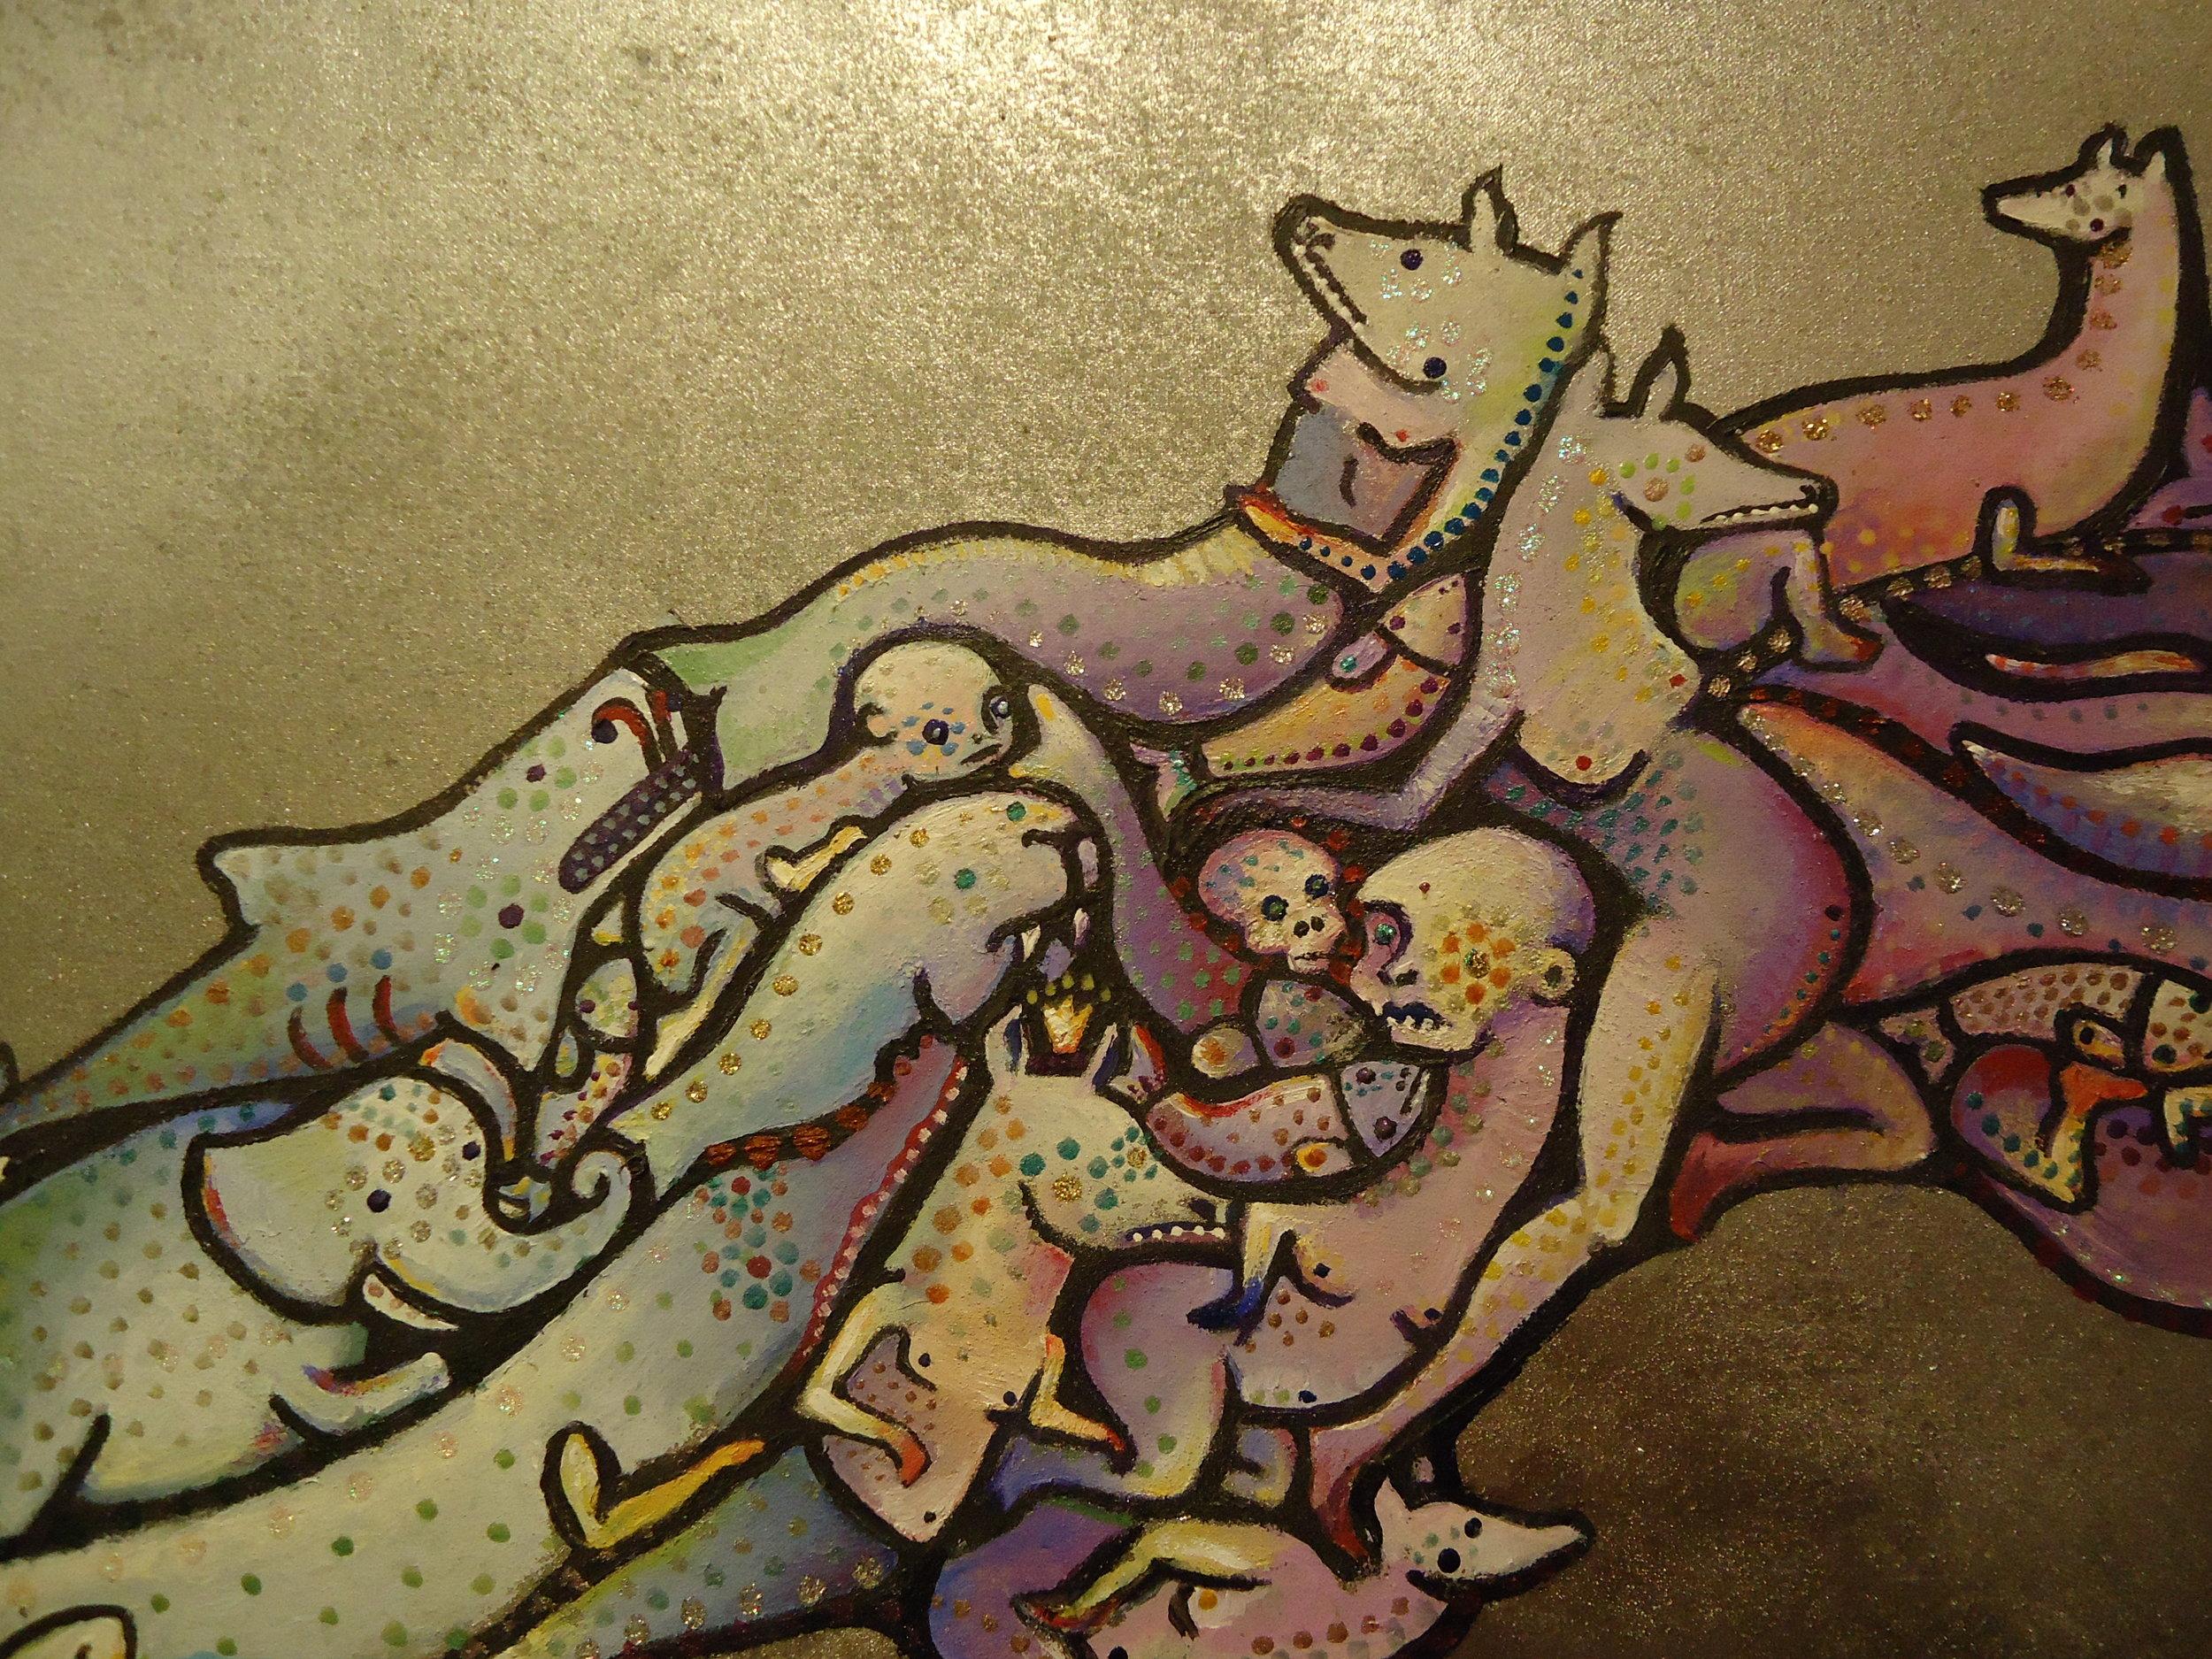 animal-art-painted-work-2013.jpg